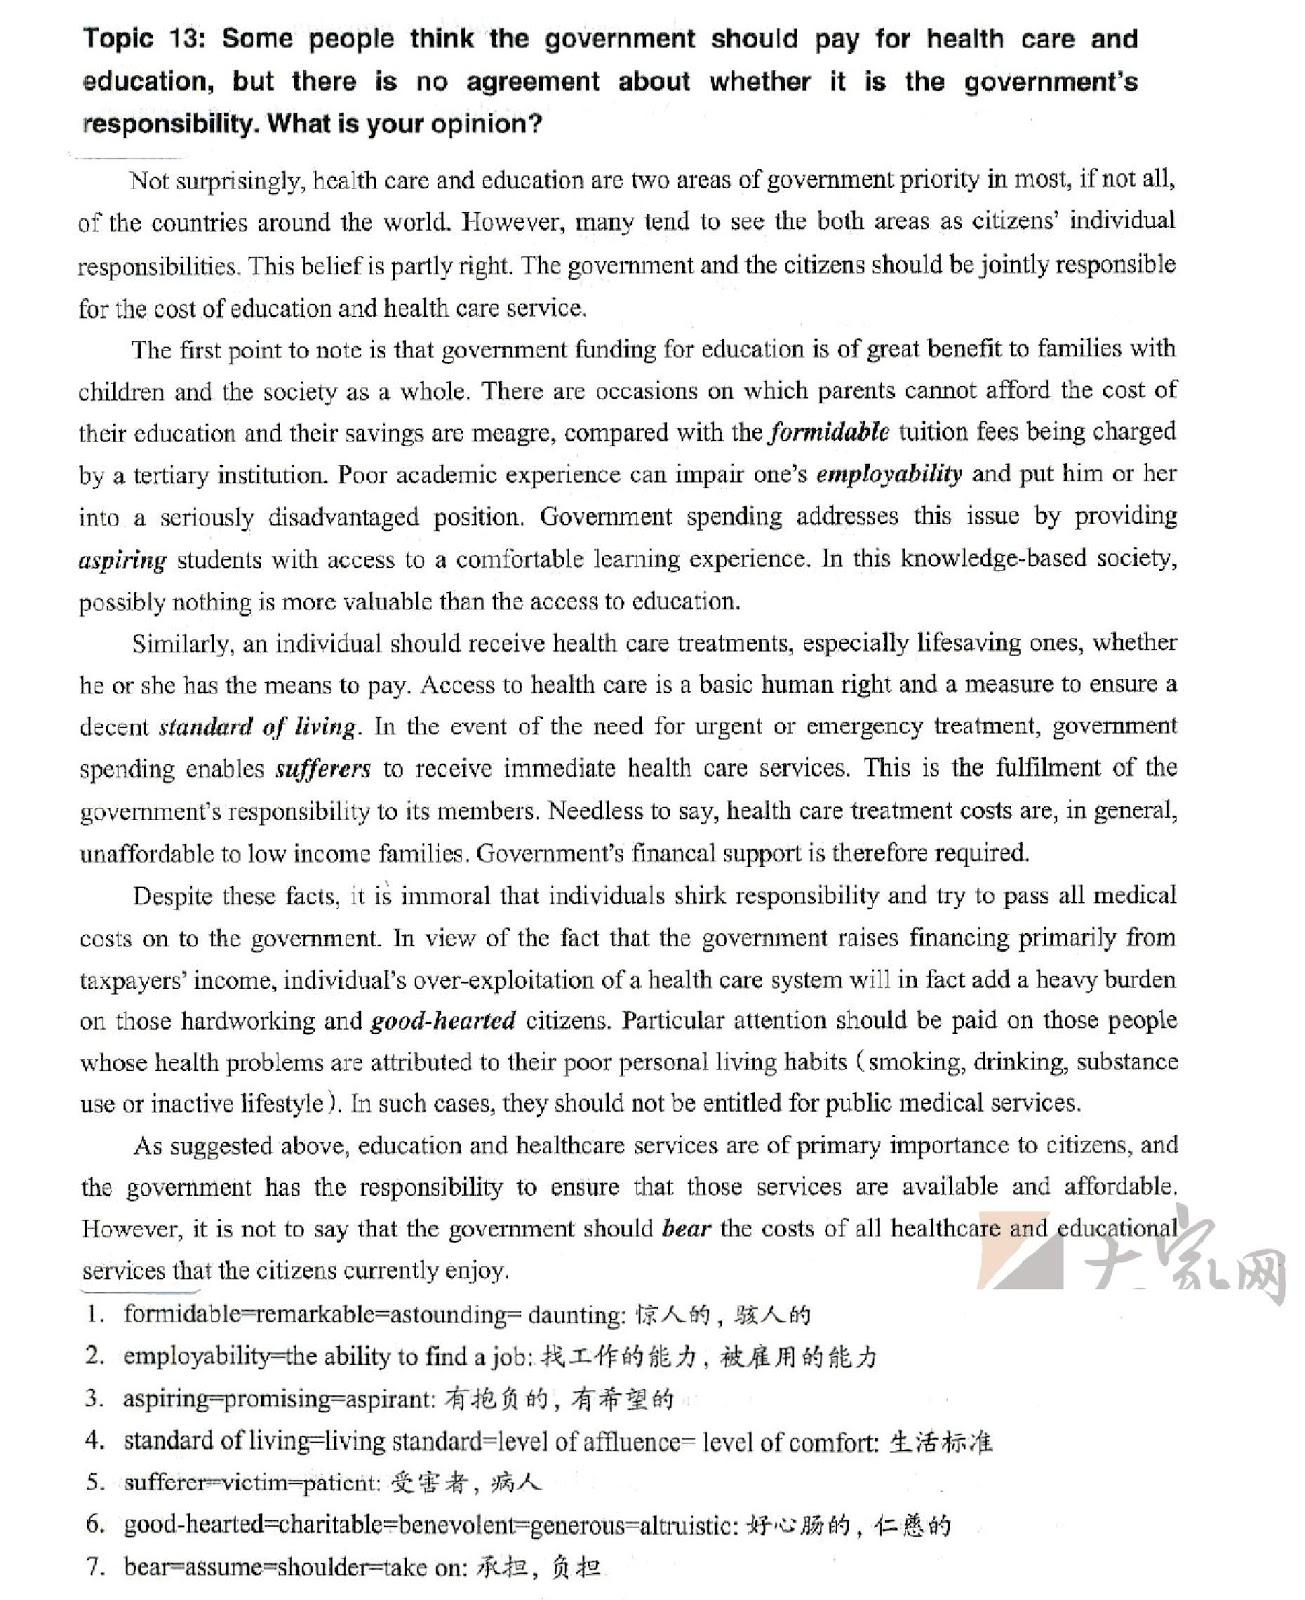 008 Writingtask2rezagholami0013 Ielts Essay Writing General Training Unique Topics For Pdf Samples Full